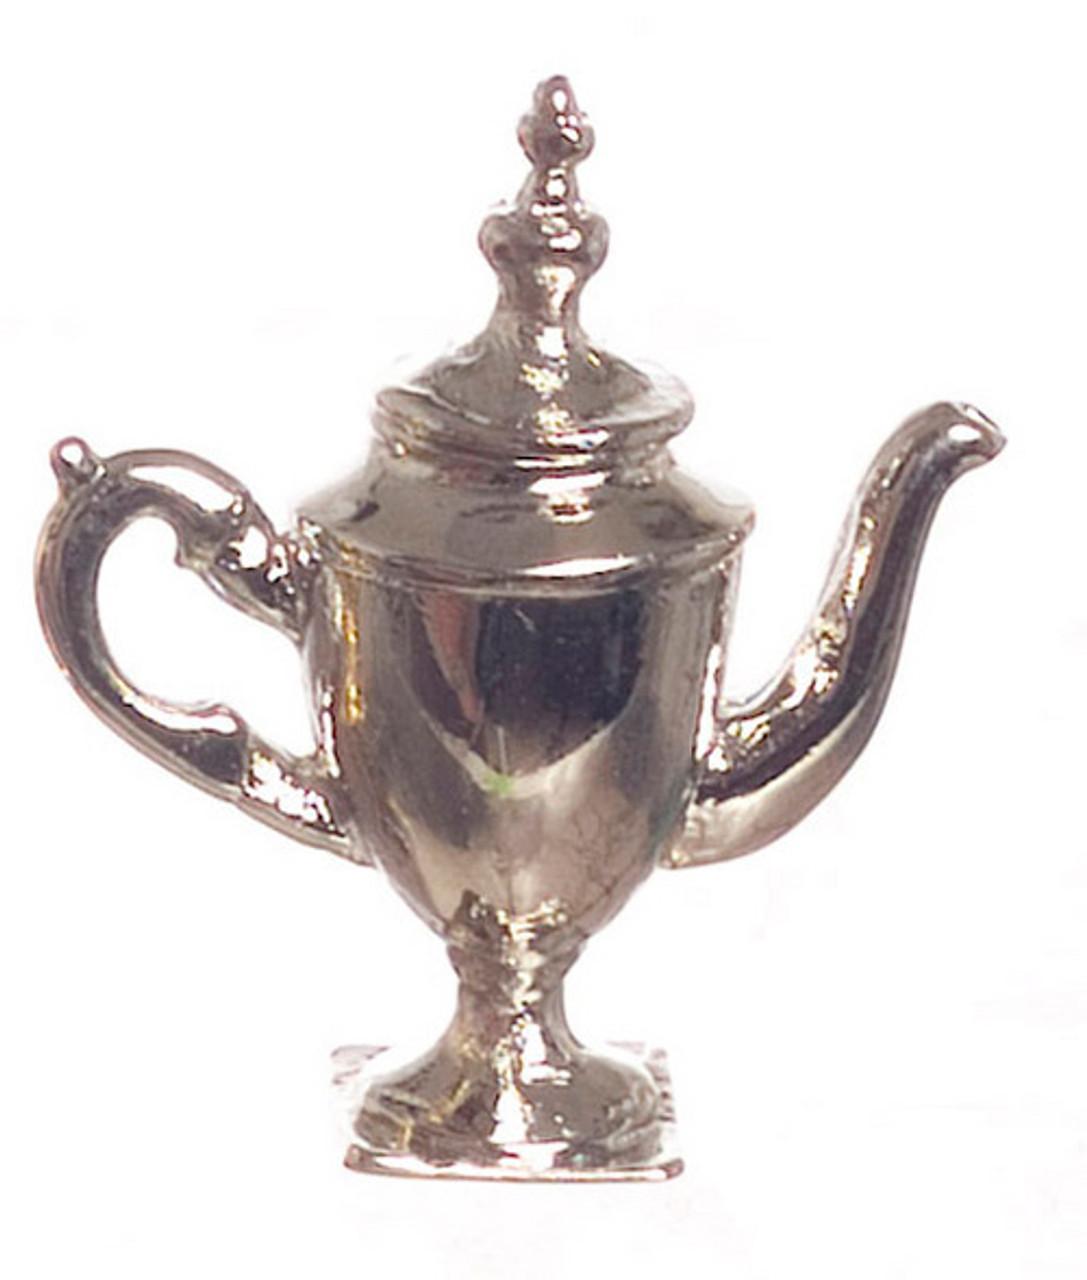 Dollhouse City - Dollhouse Miniatures Coffee Pot - Silver